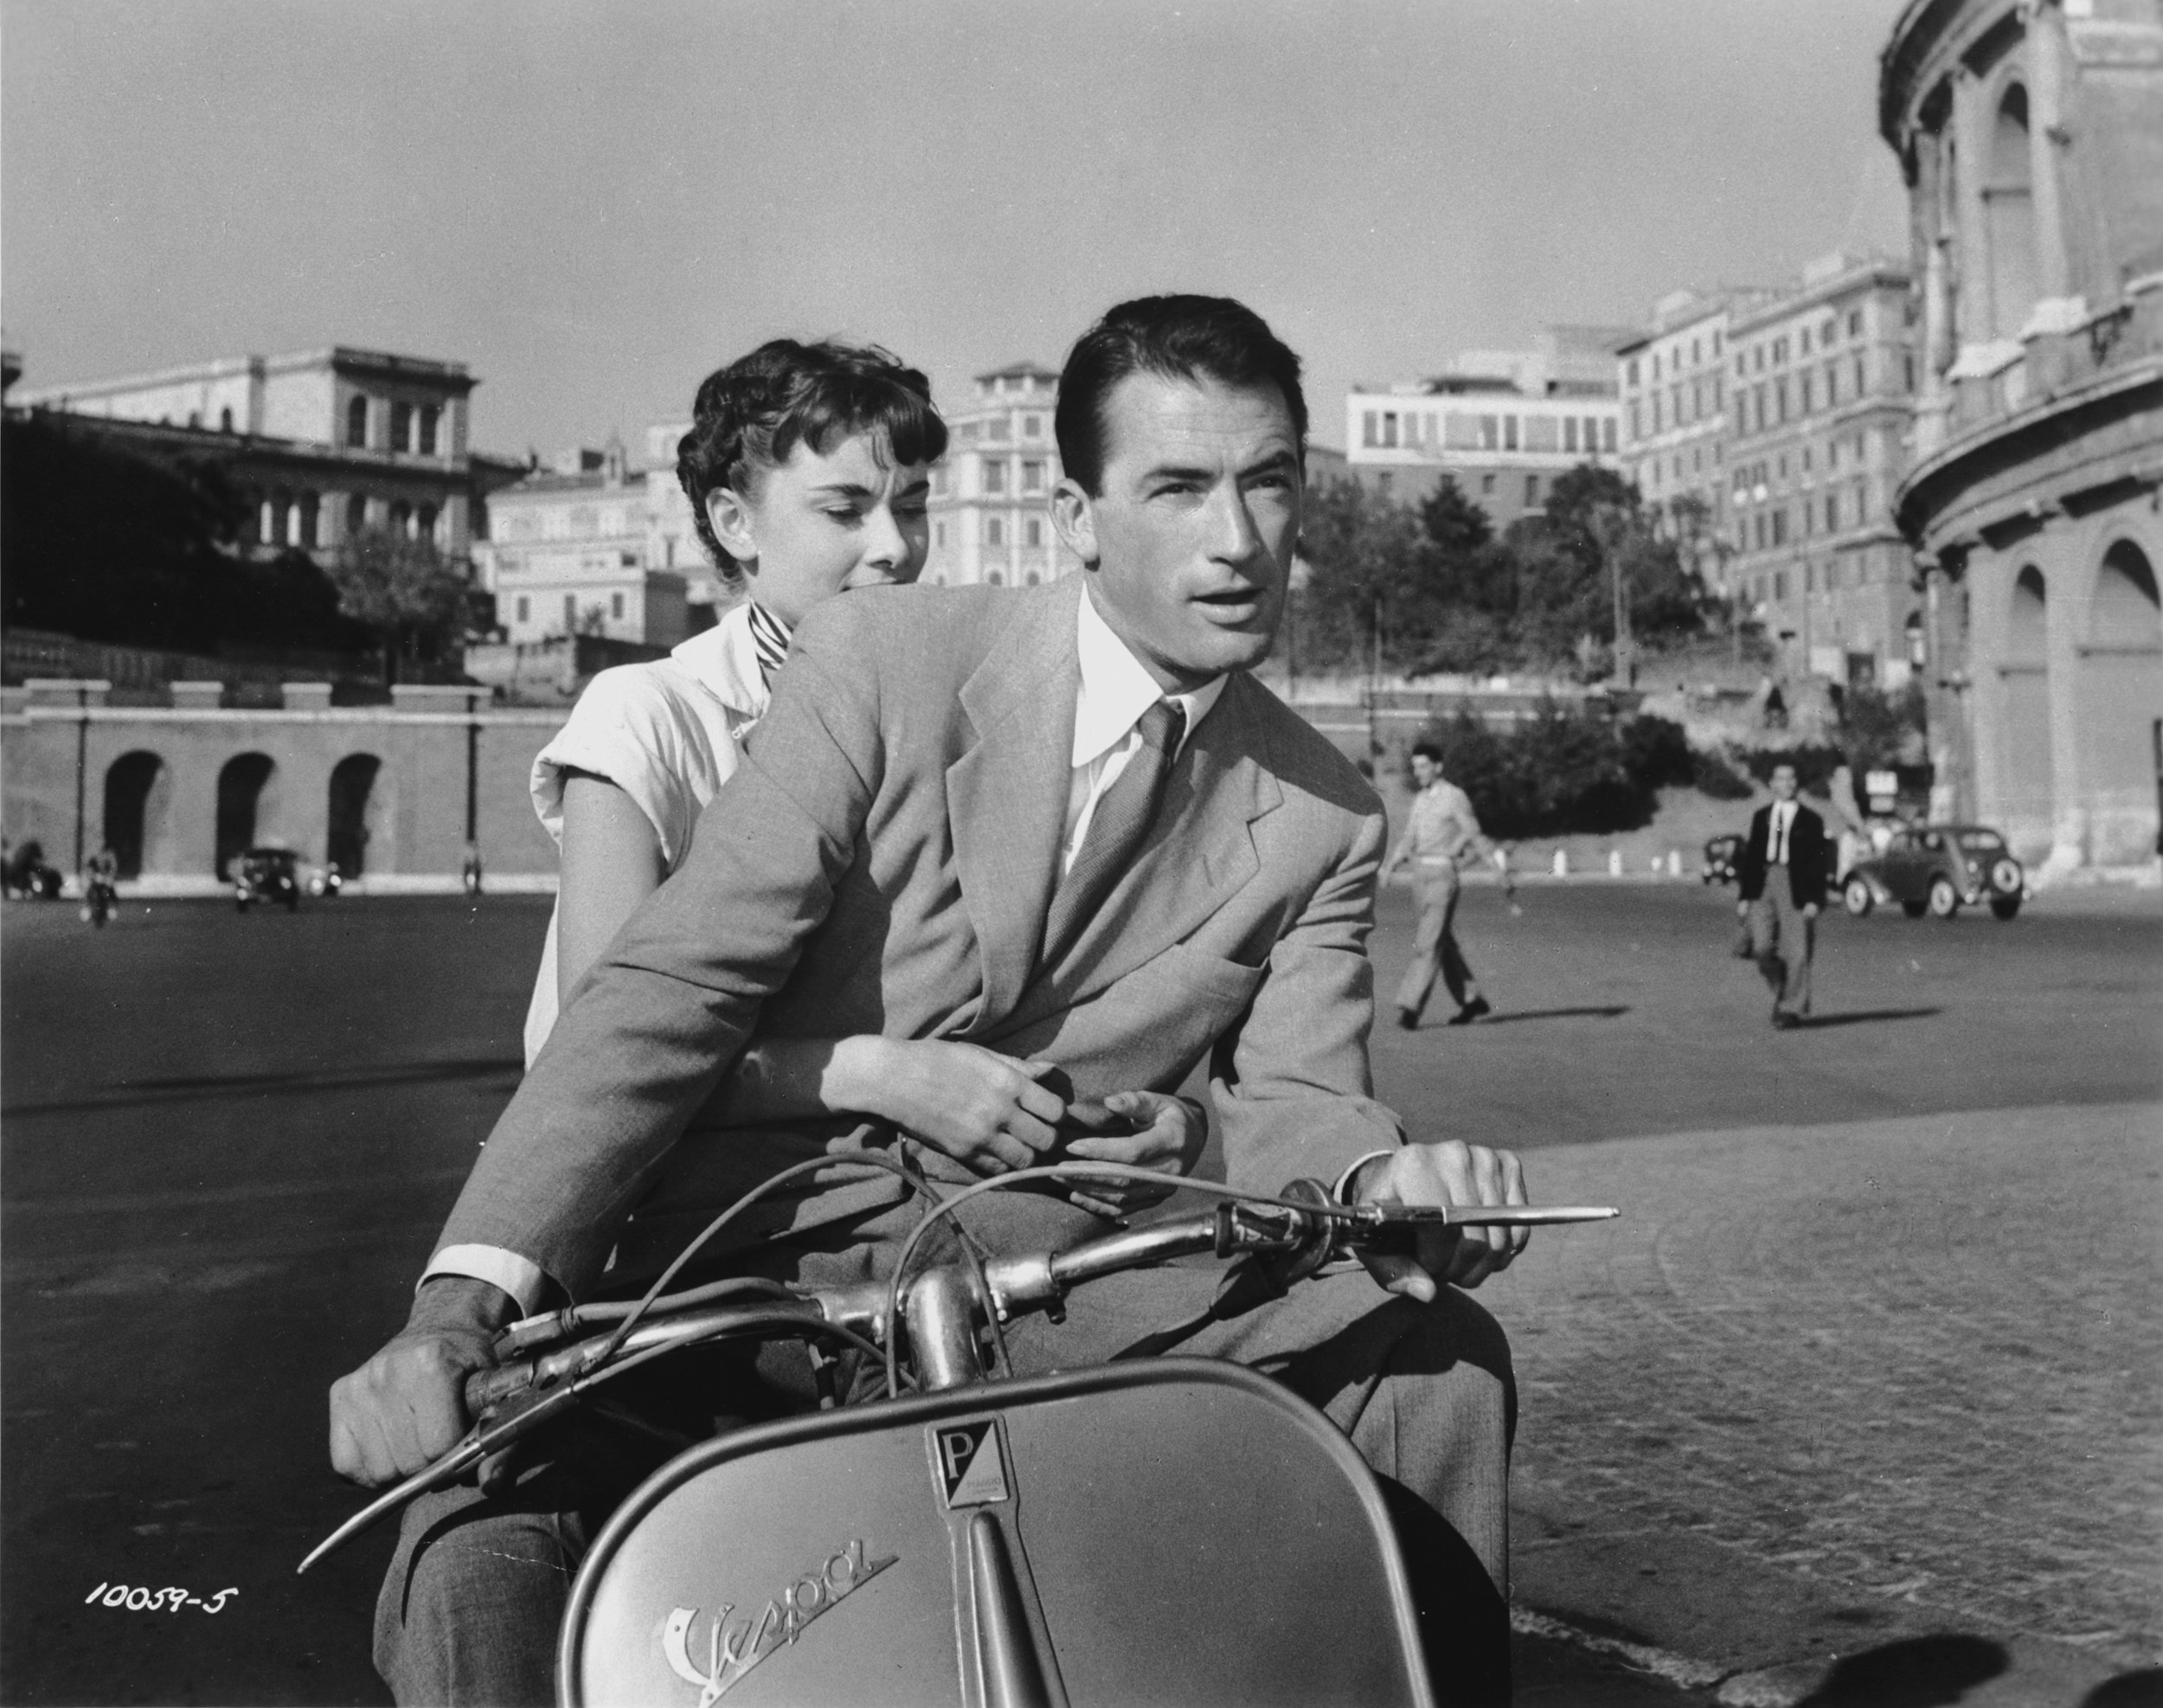 146. Roman Holiday (1953)